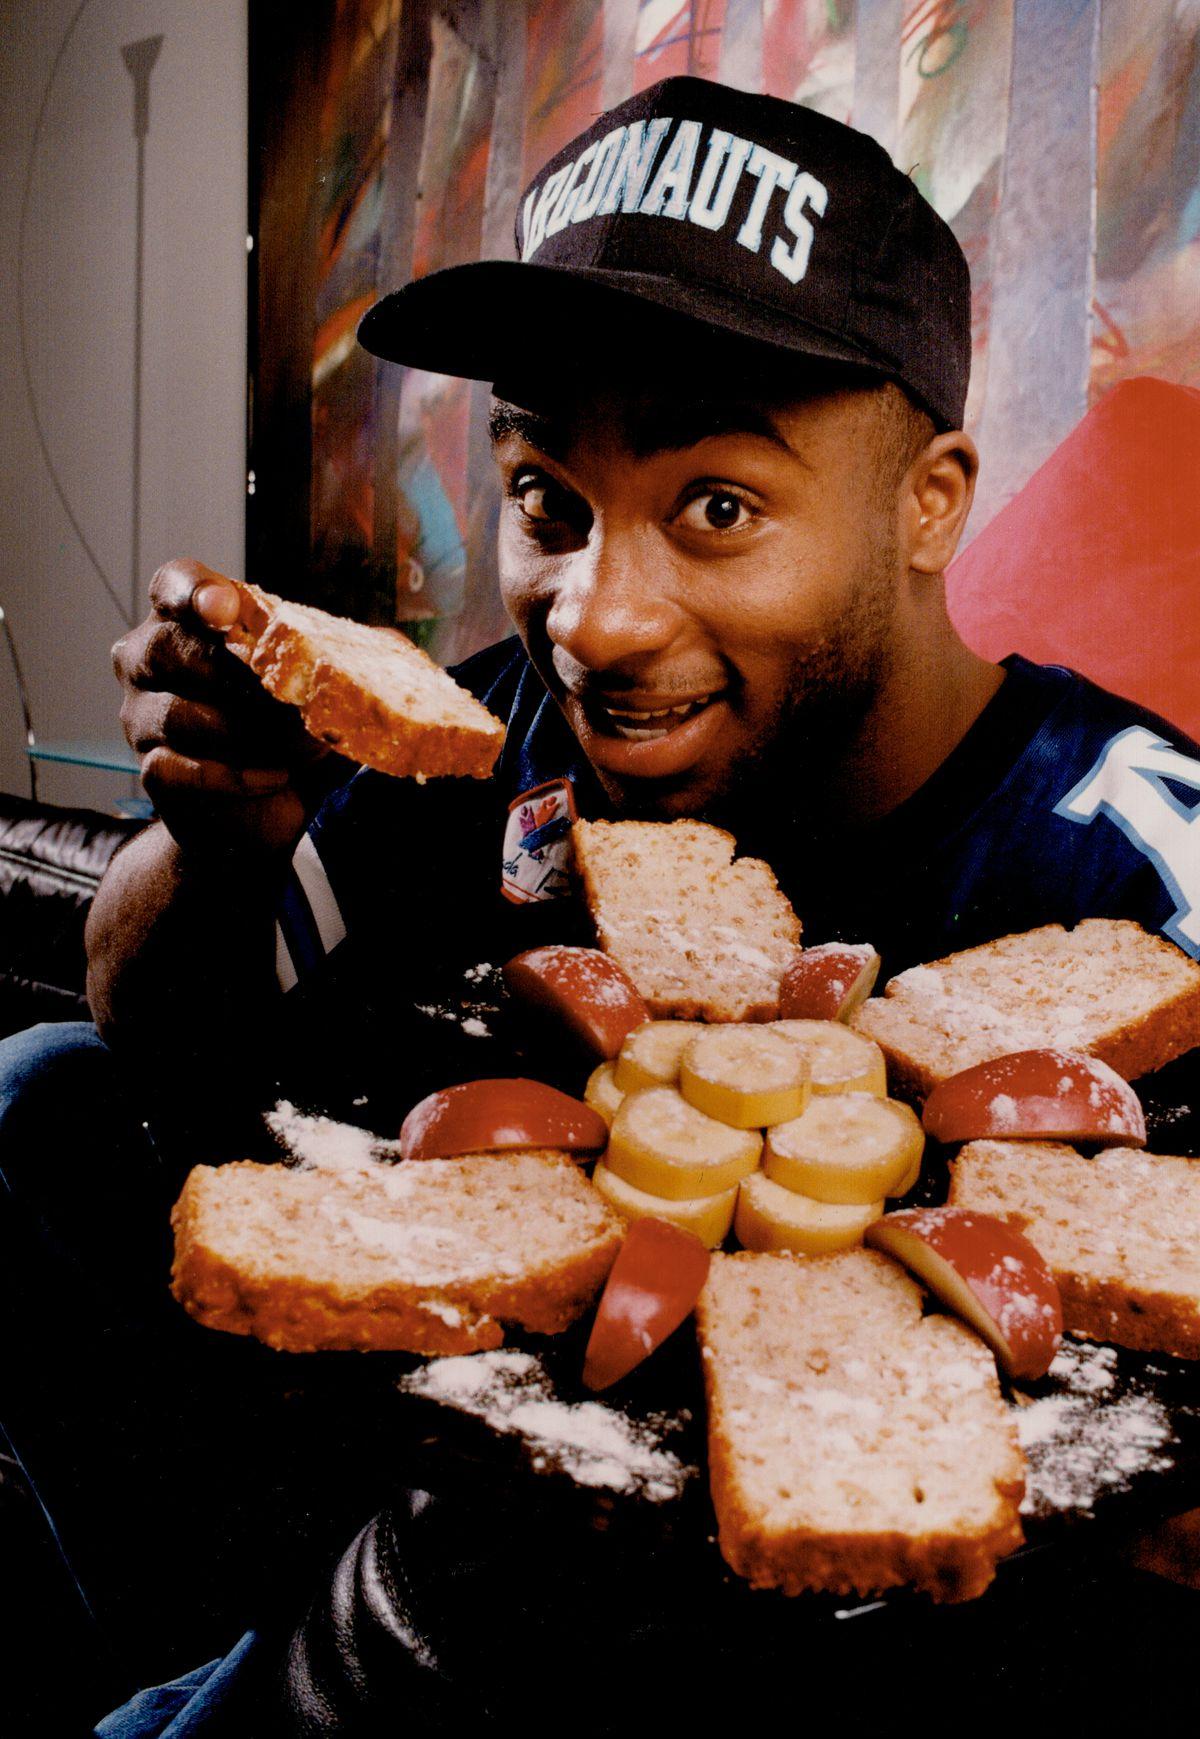 Rocket fuel: Raghib Ismail; the Toronto Argonauts star quarterback; chows down on some tasty banana